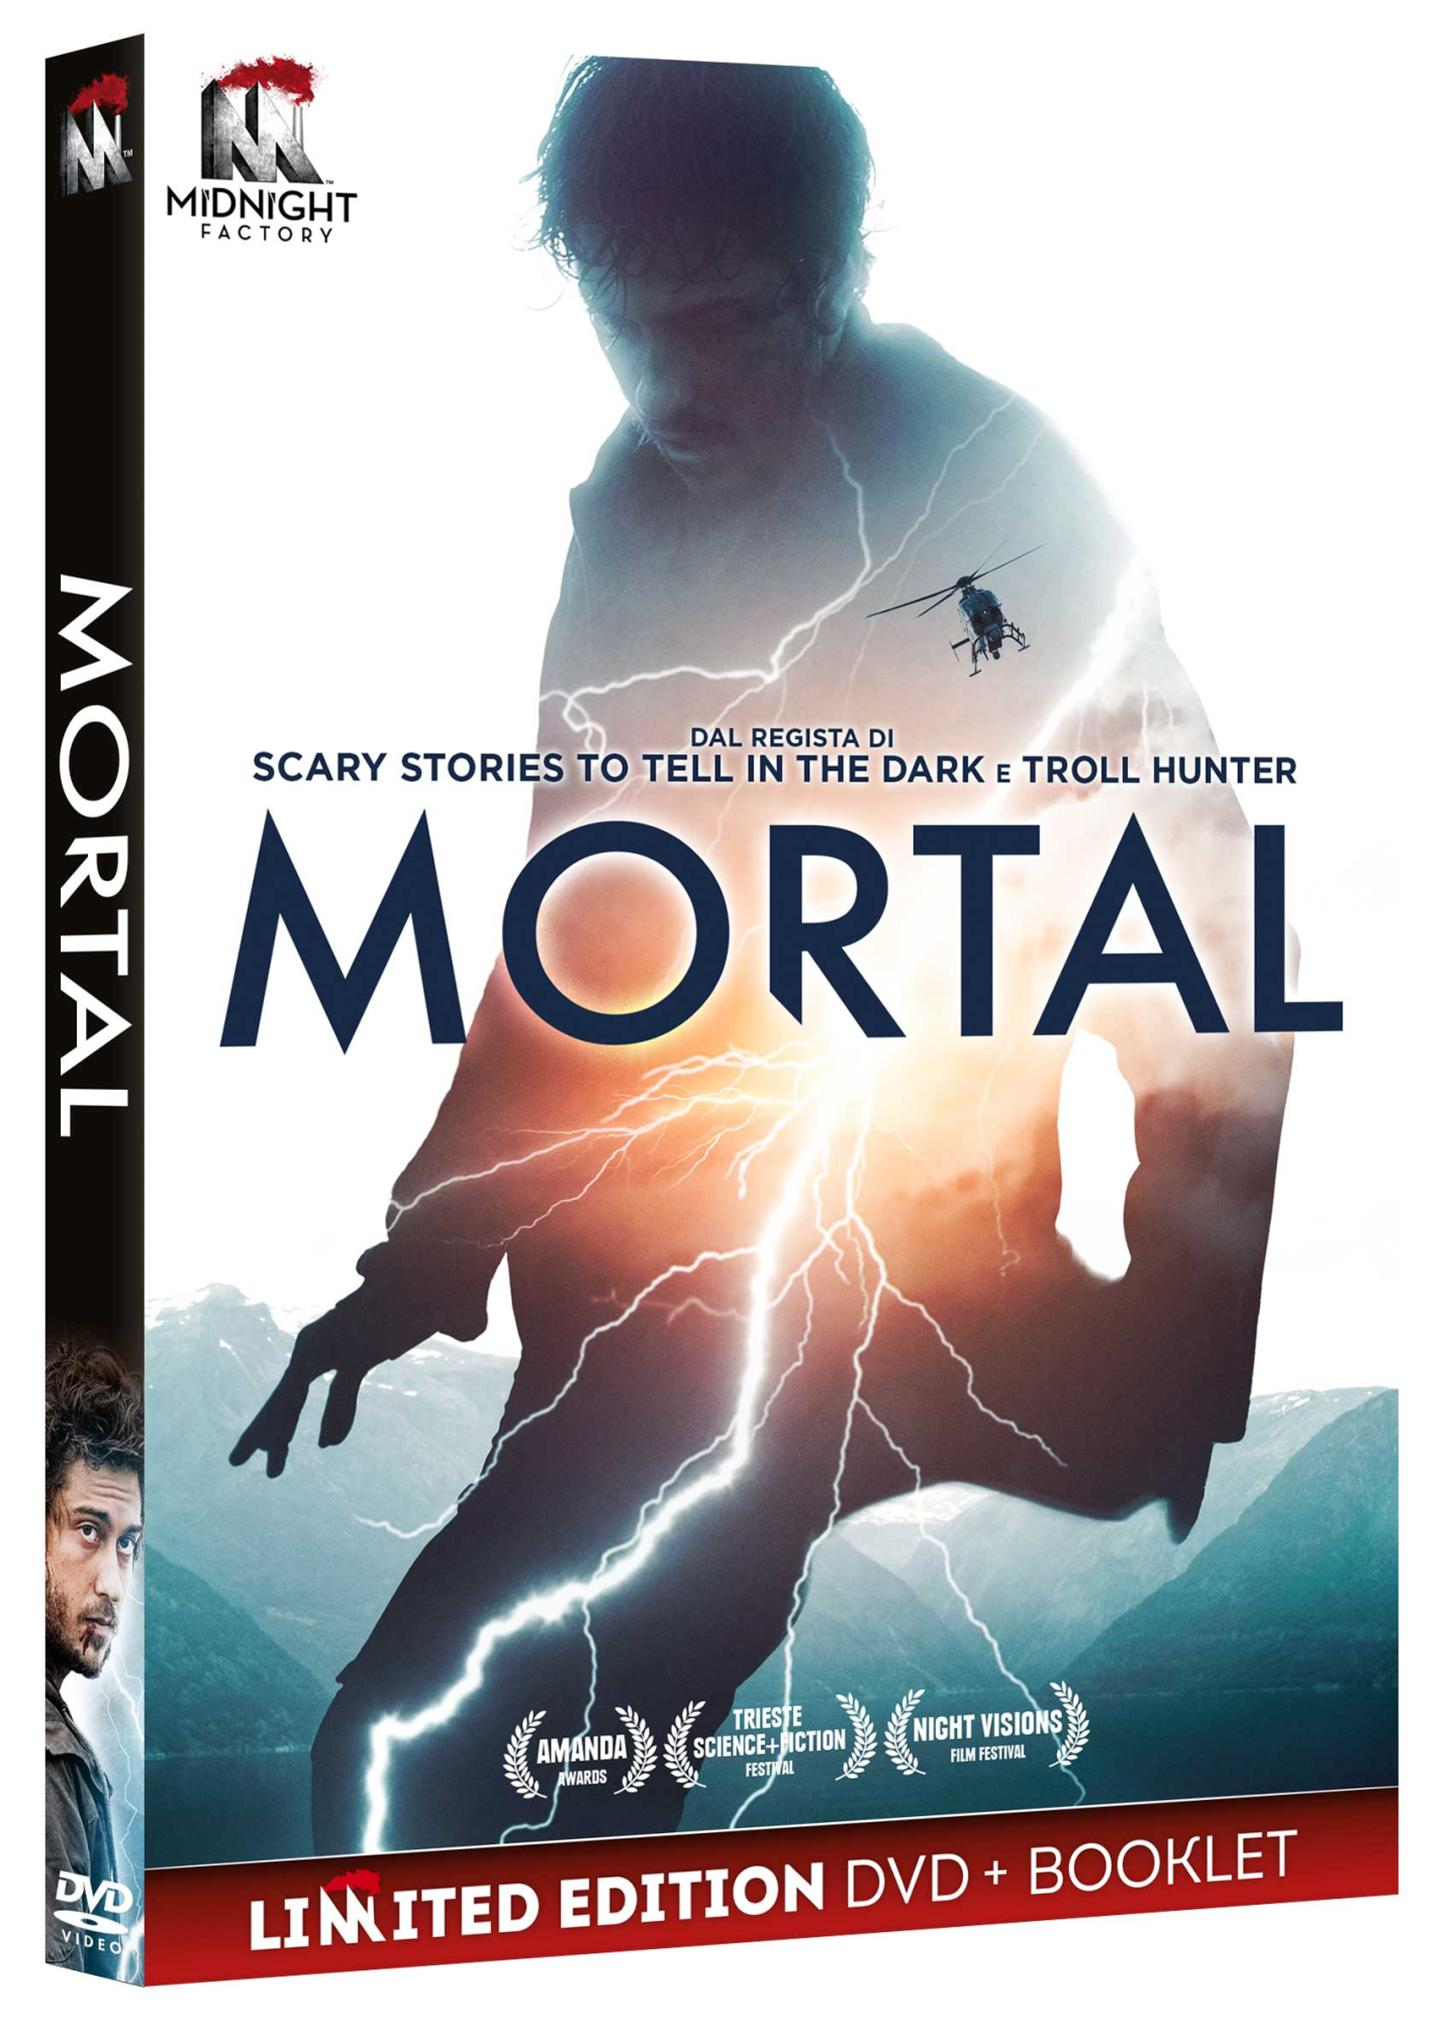 MORTAL (DVD+BOOKLET) (DVD)